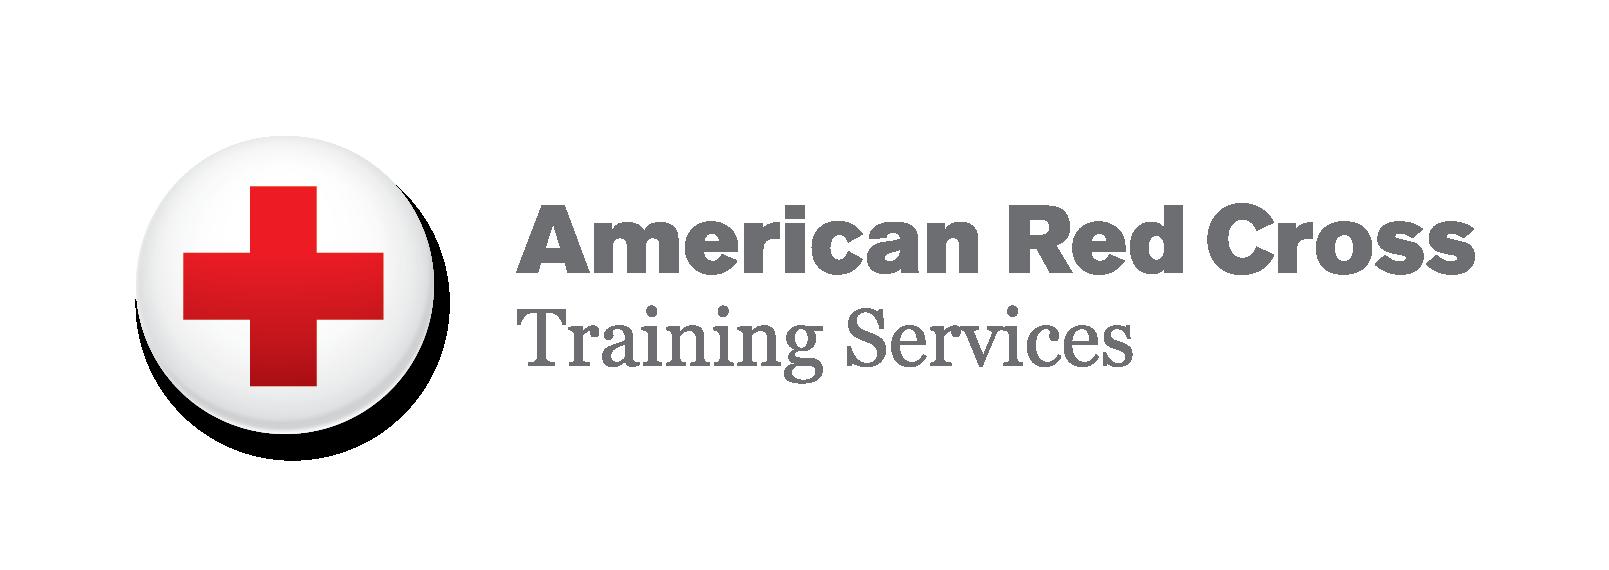 www instructorscorner org login